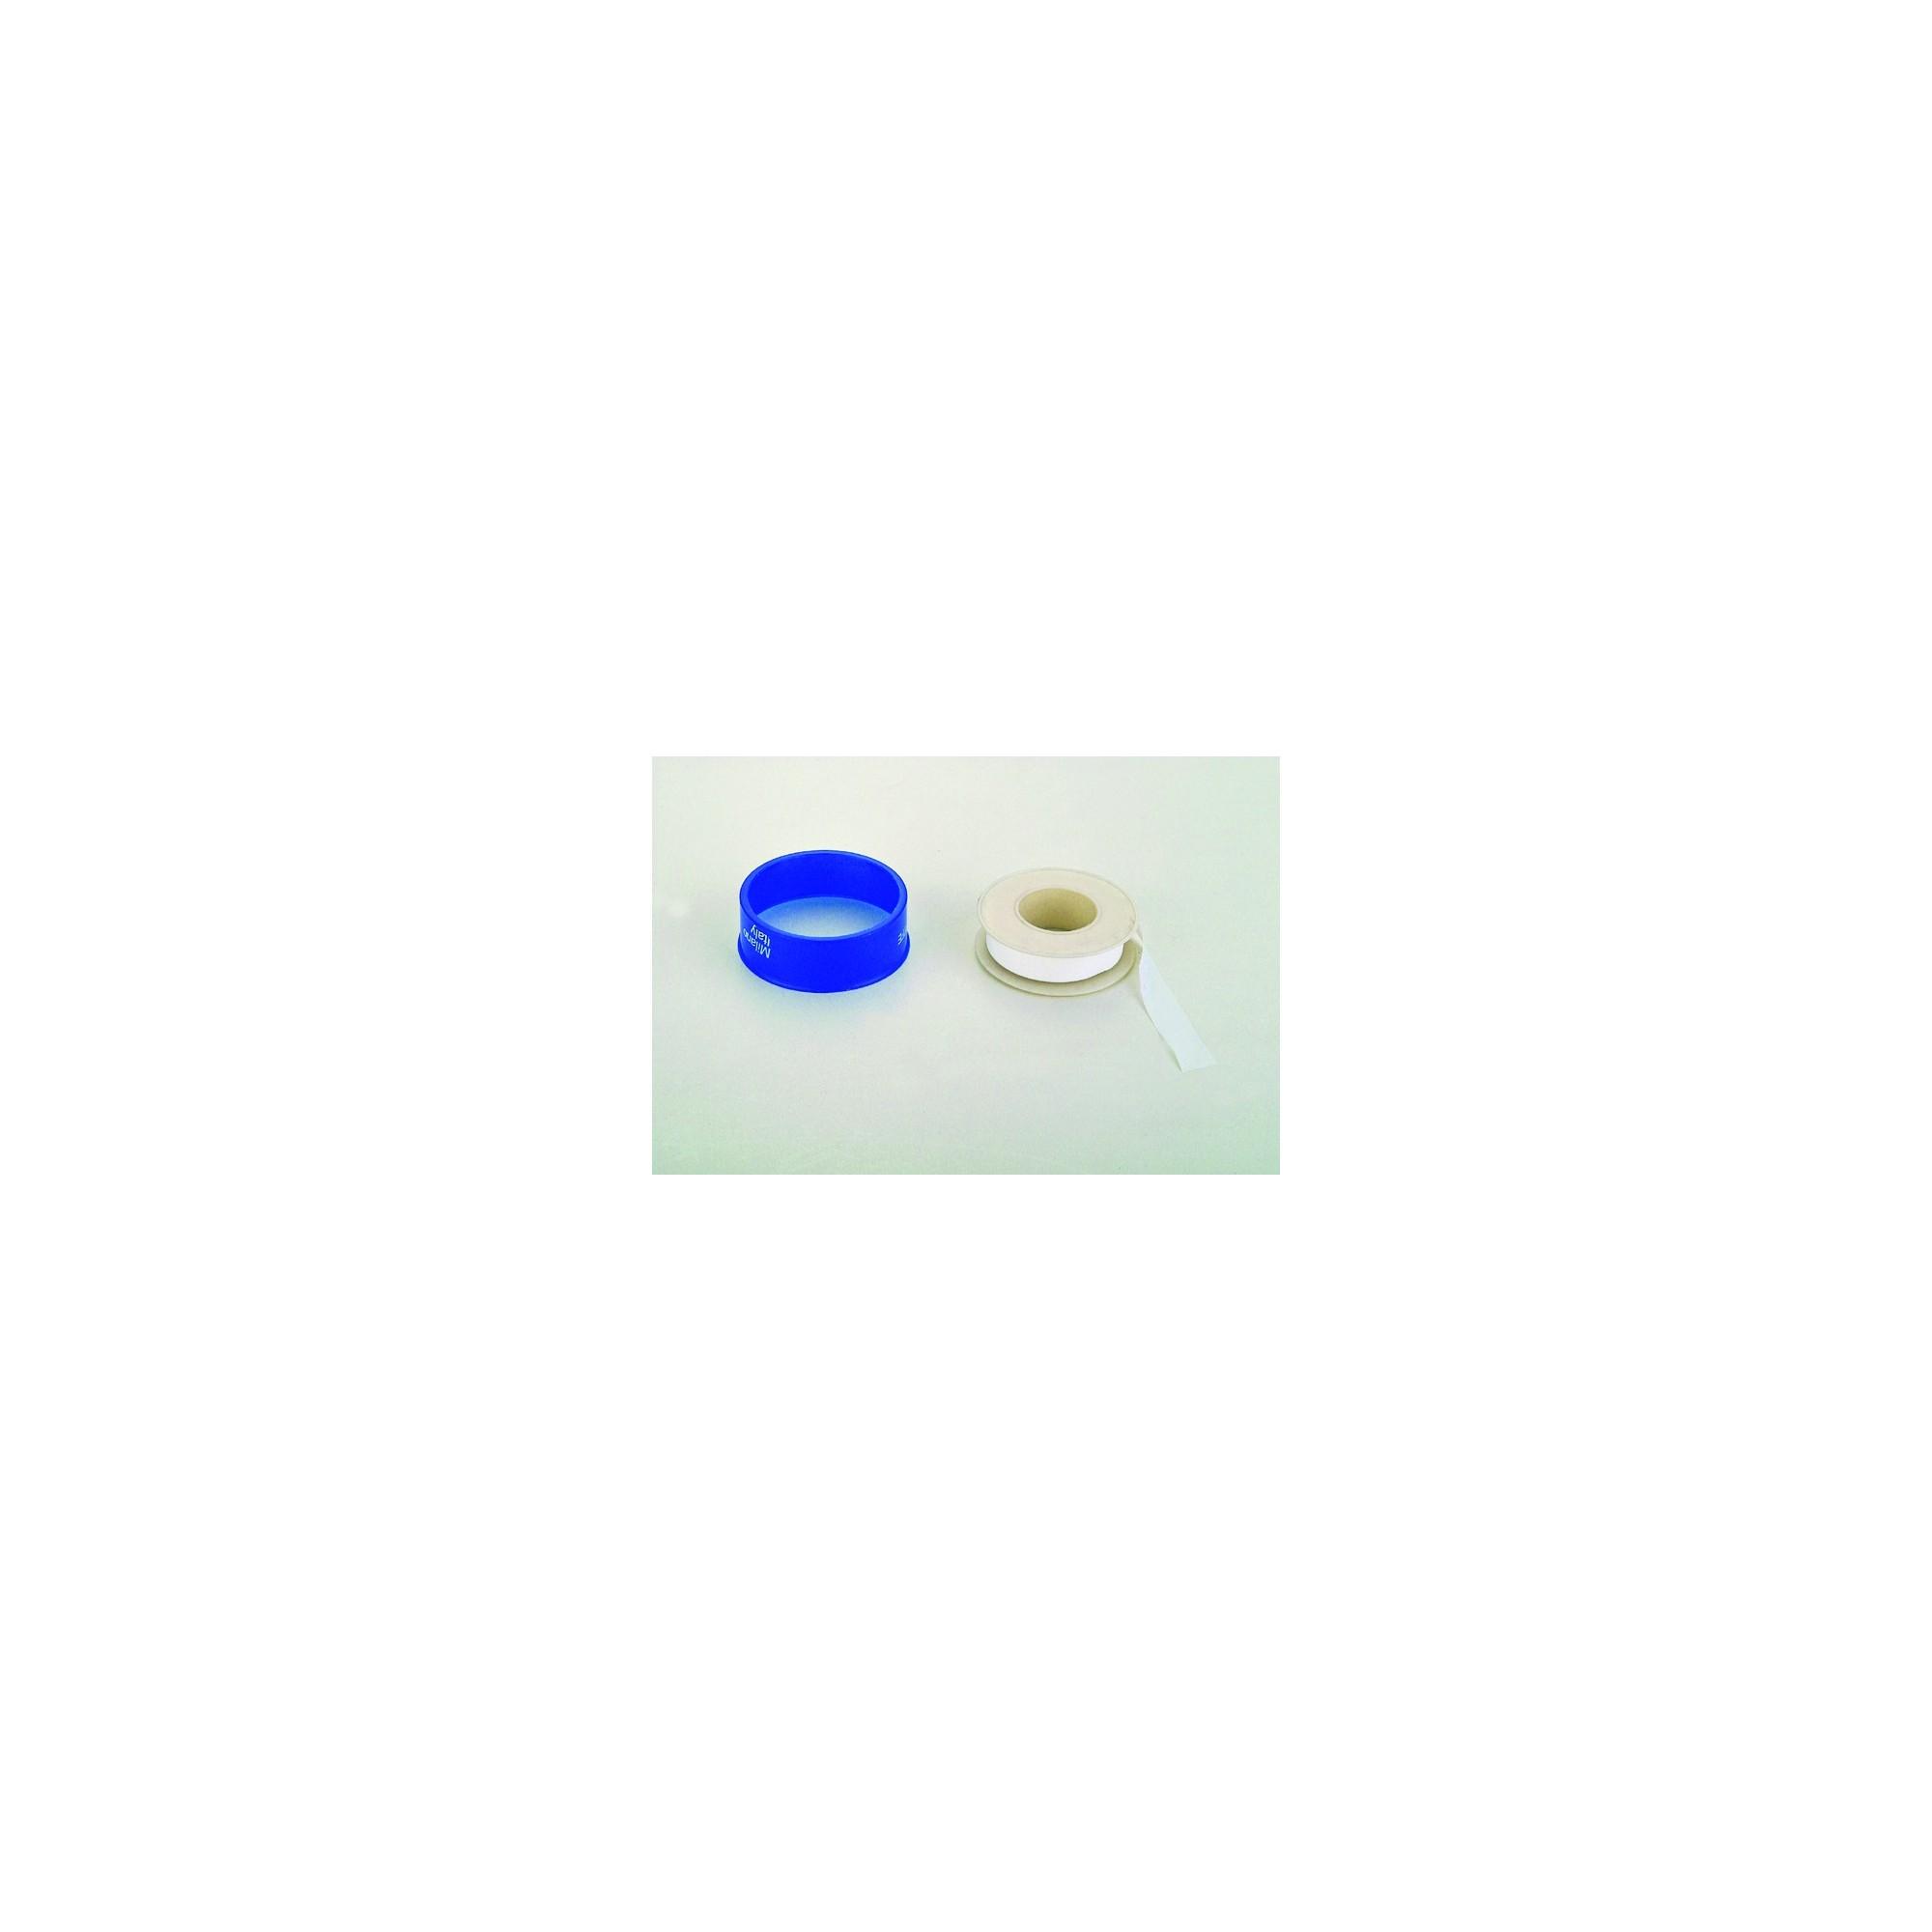 Фум лента синяя PROFI Milano 19*0.2*15м  - 1